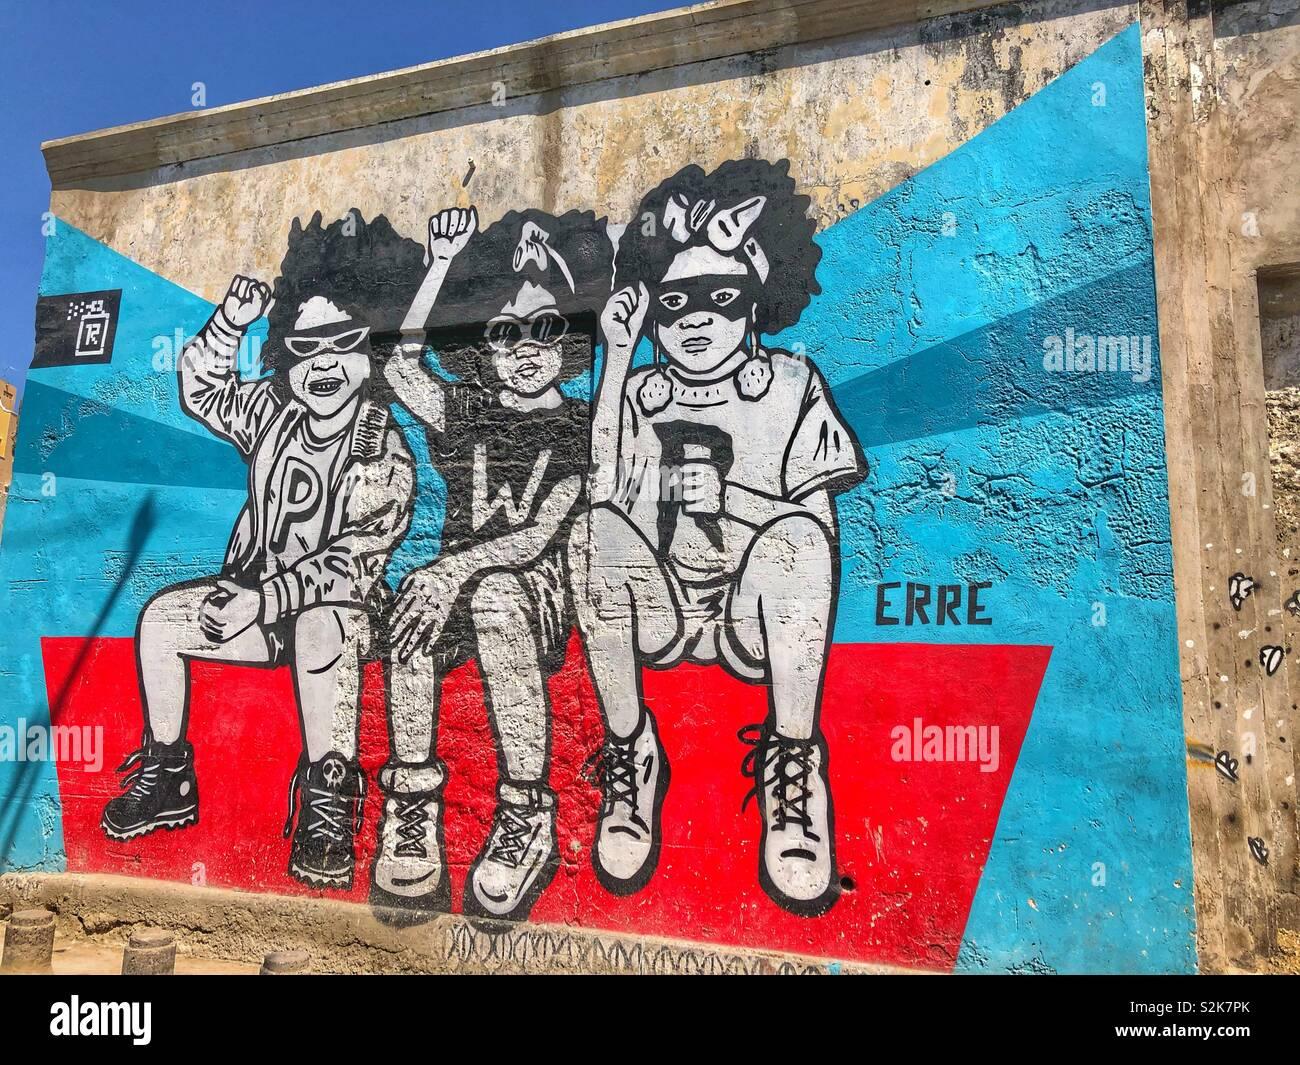 Belle Urban street art in the Getsemani neighbourhood in Cartagena FX-31